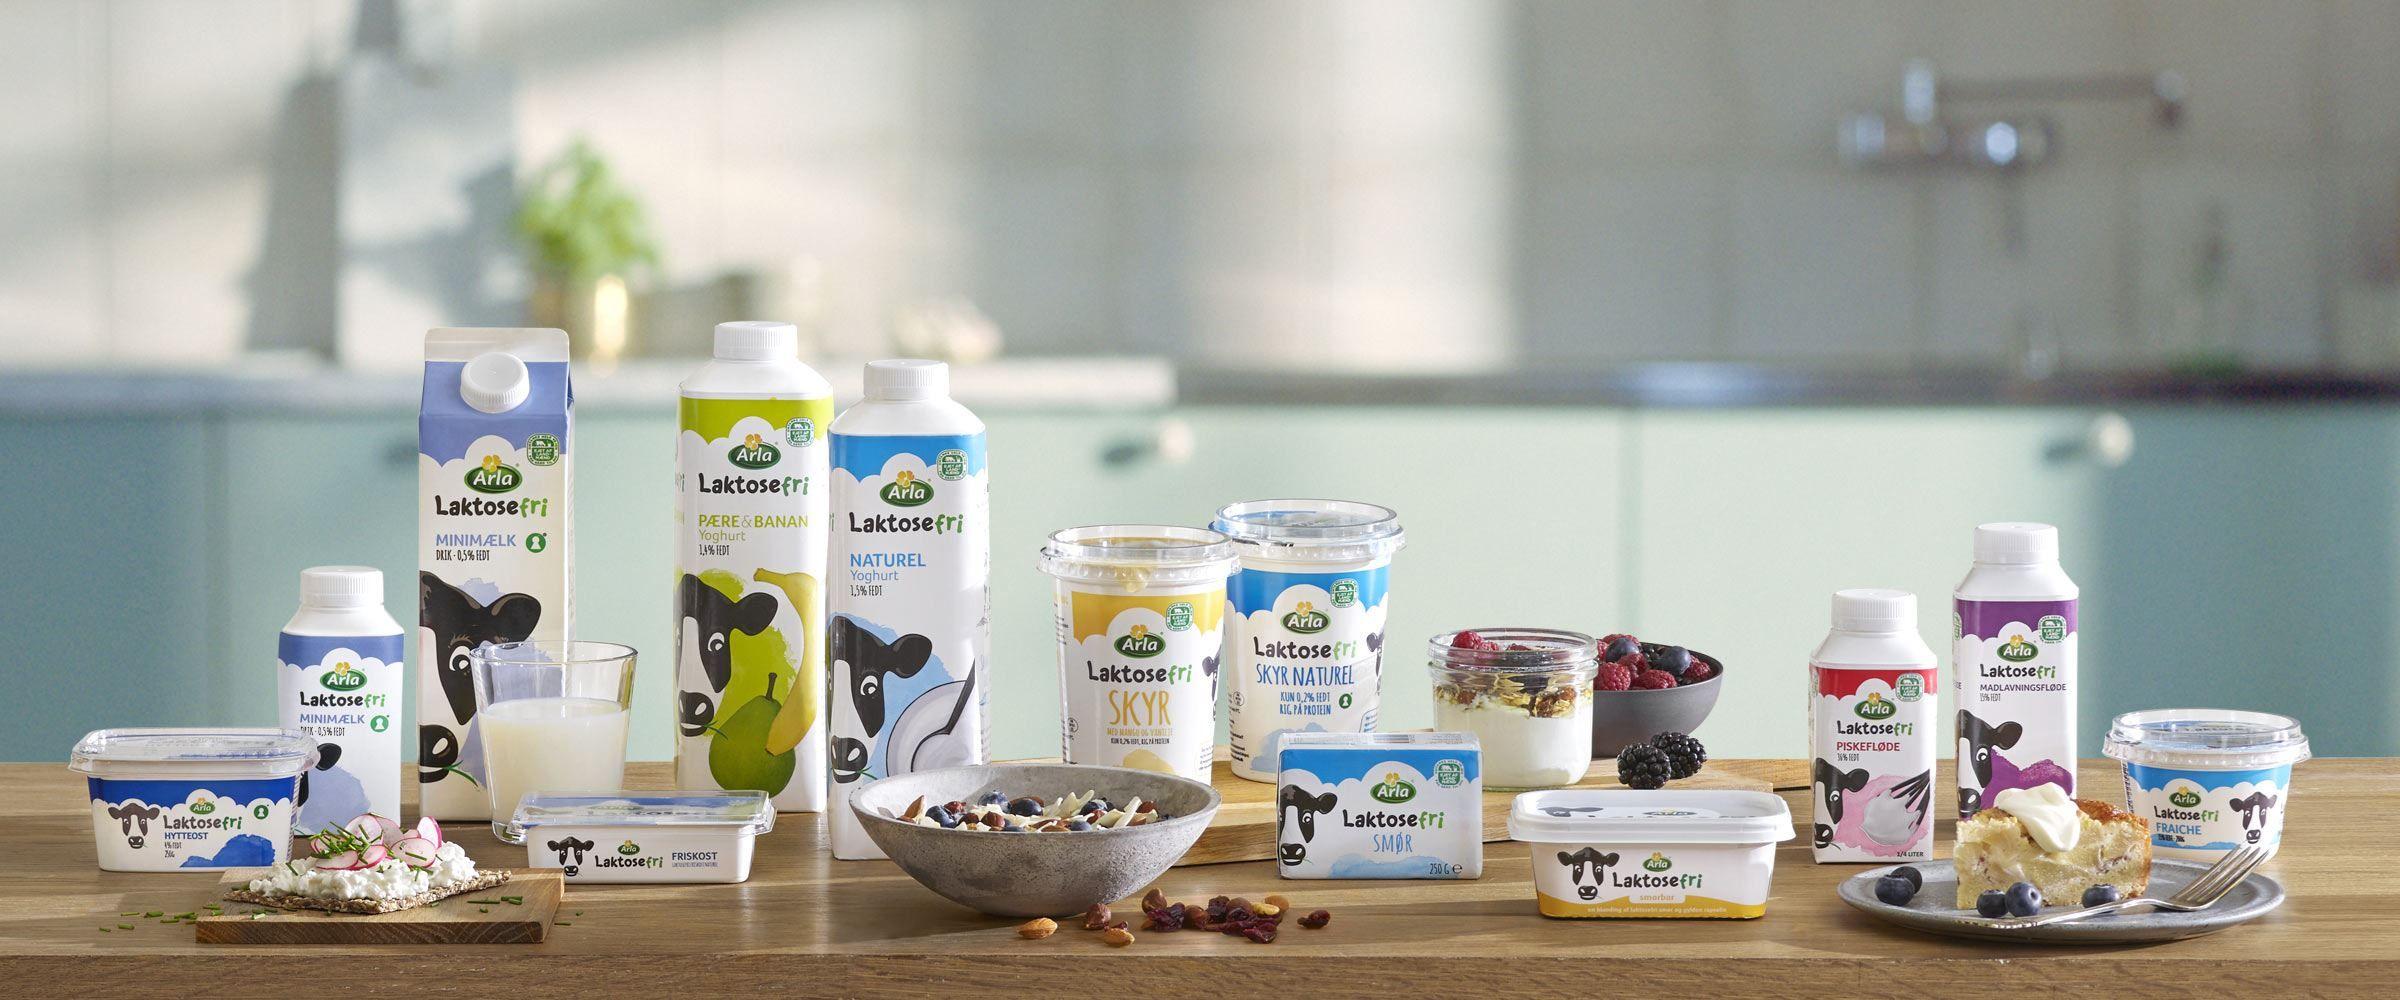 Fin Arla® Laktosefri - information om laktosefri mælkeprodukter RE-19